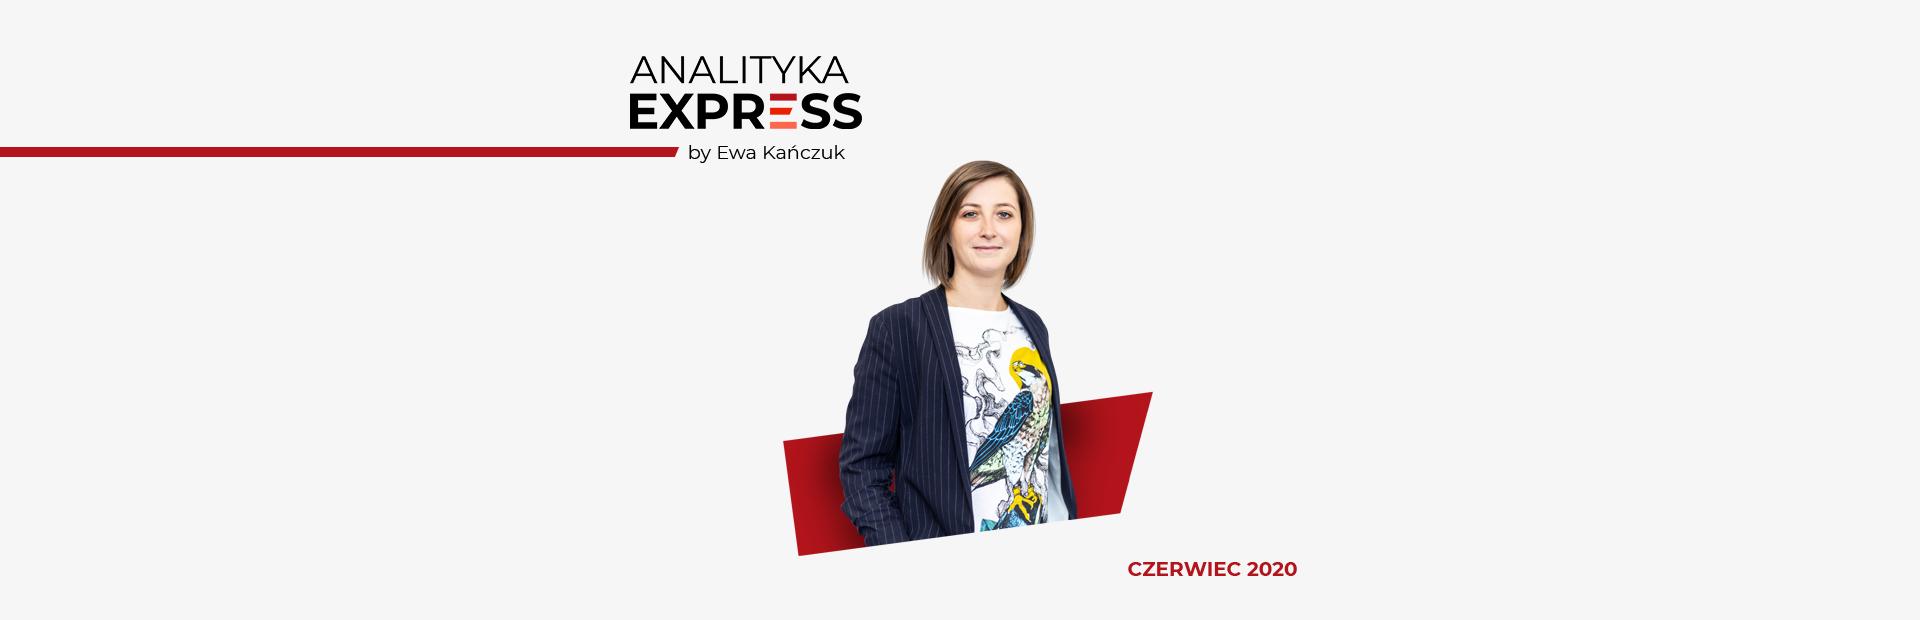 Analityka Express 6/2020